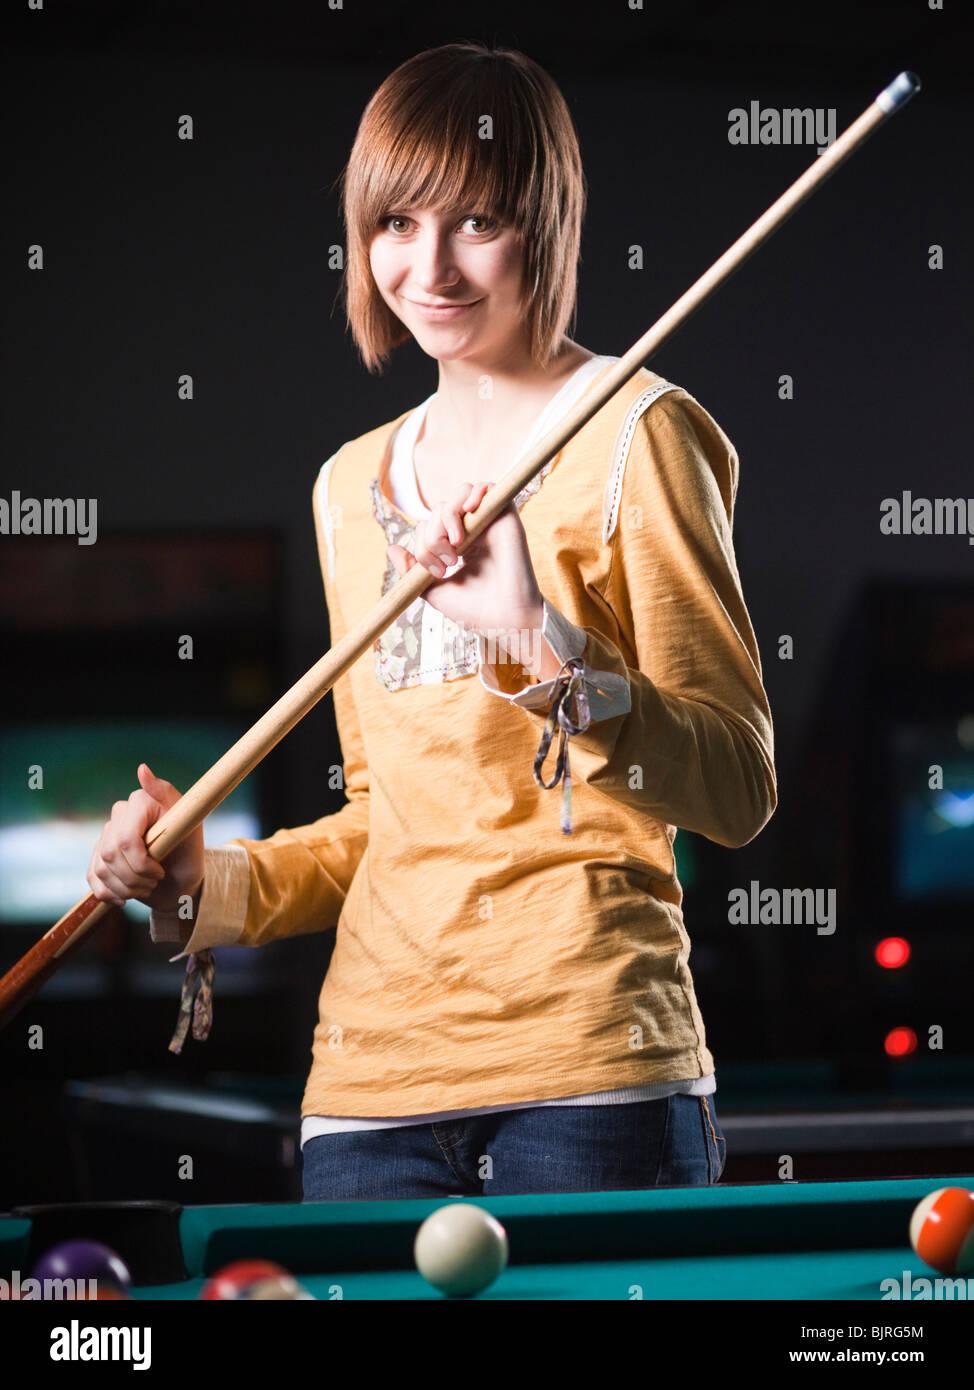 USA, Utah, American Fork, young woman standing behind pool table - Stock Image